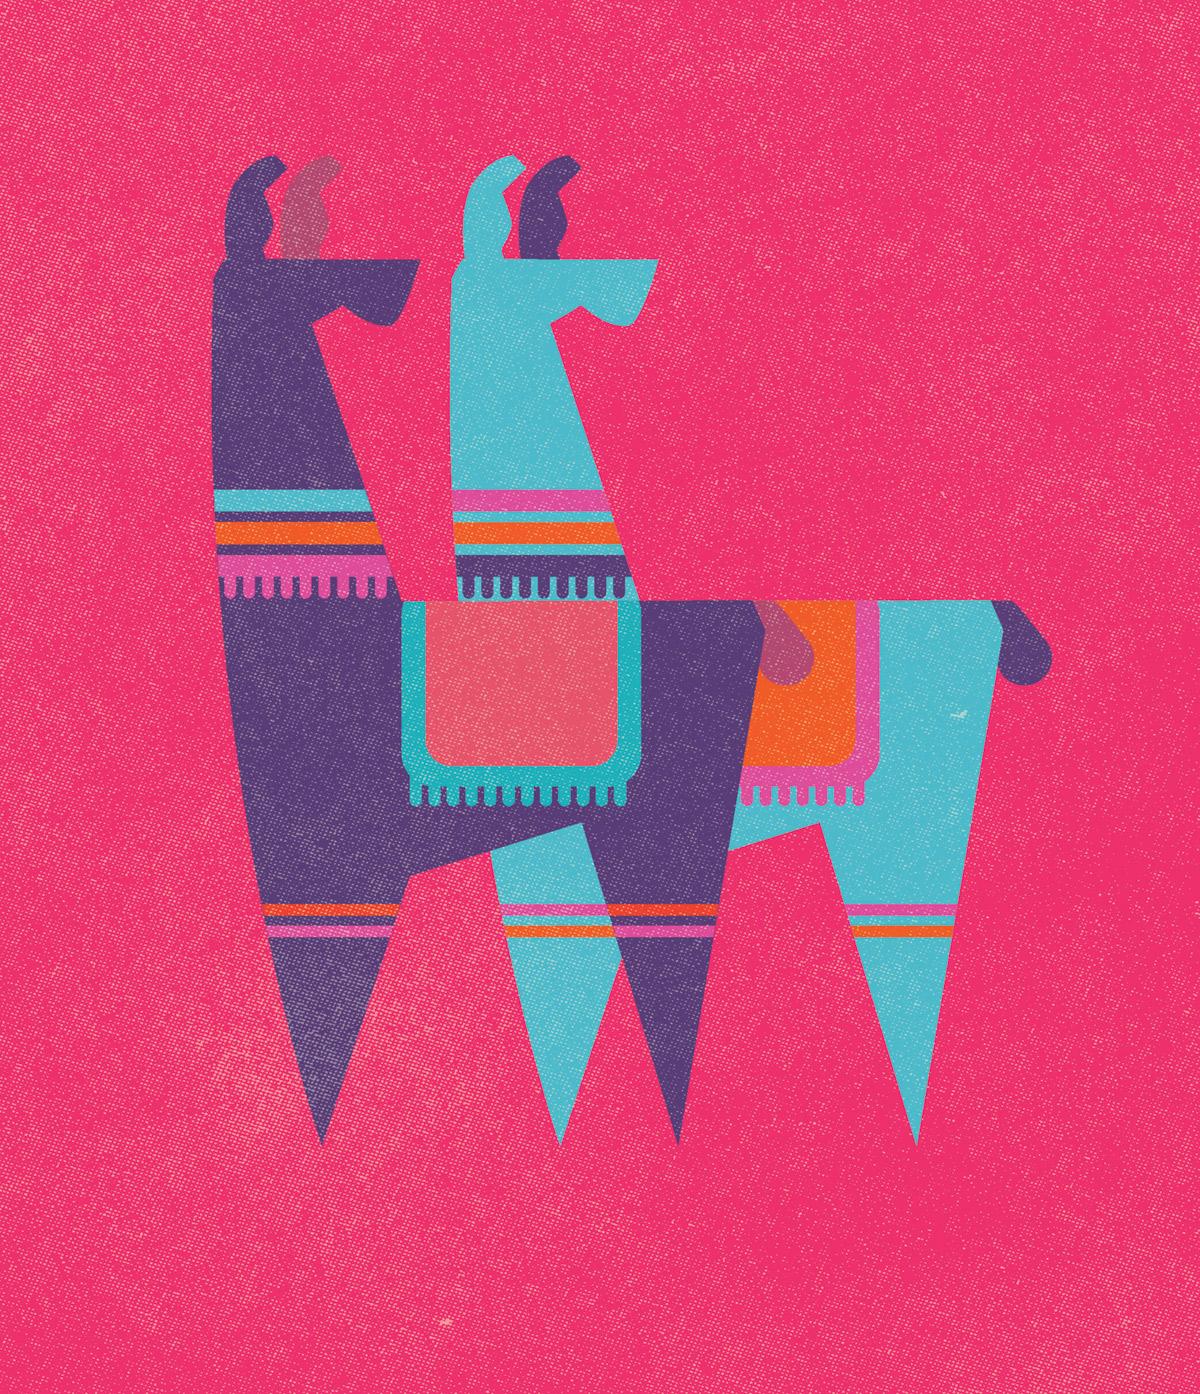 llama_illustration